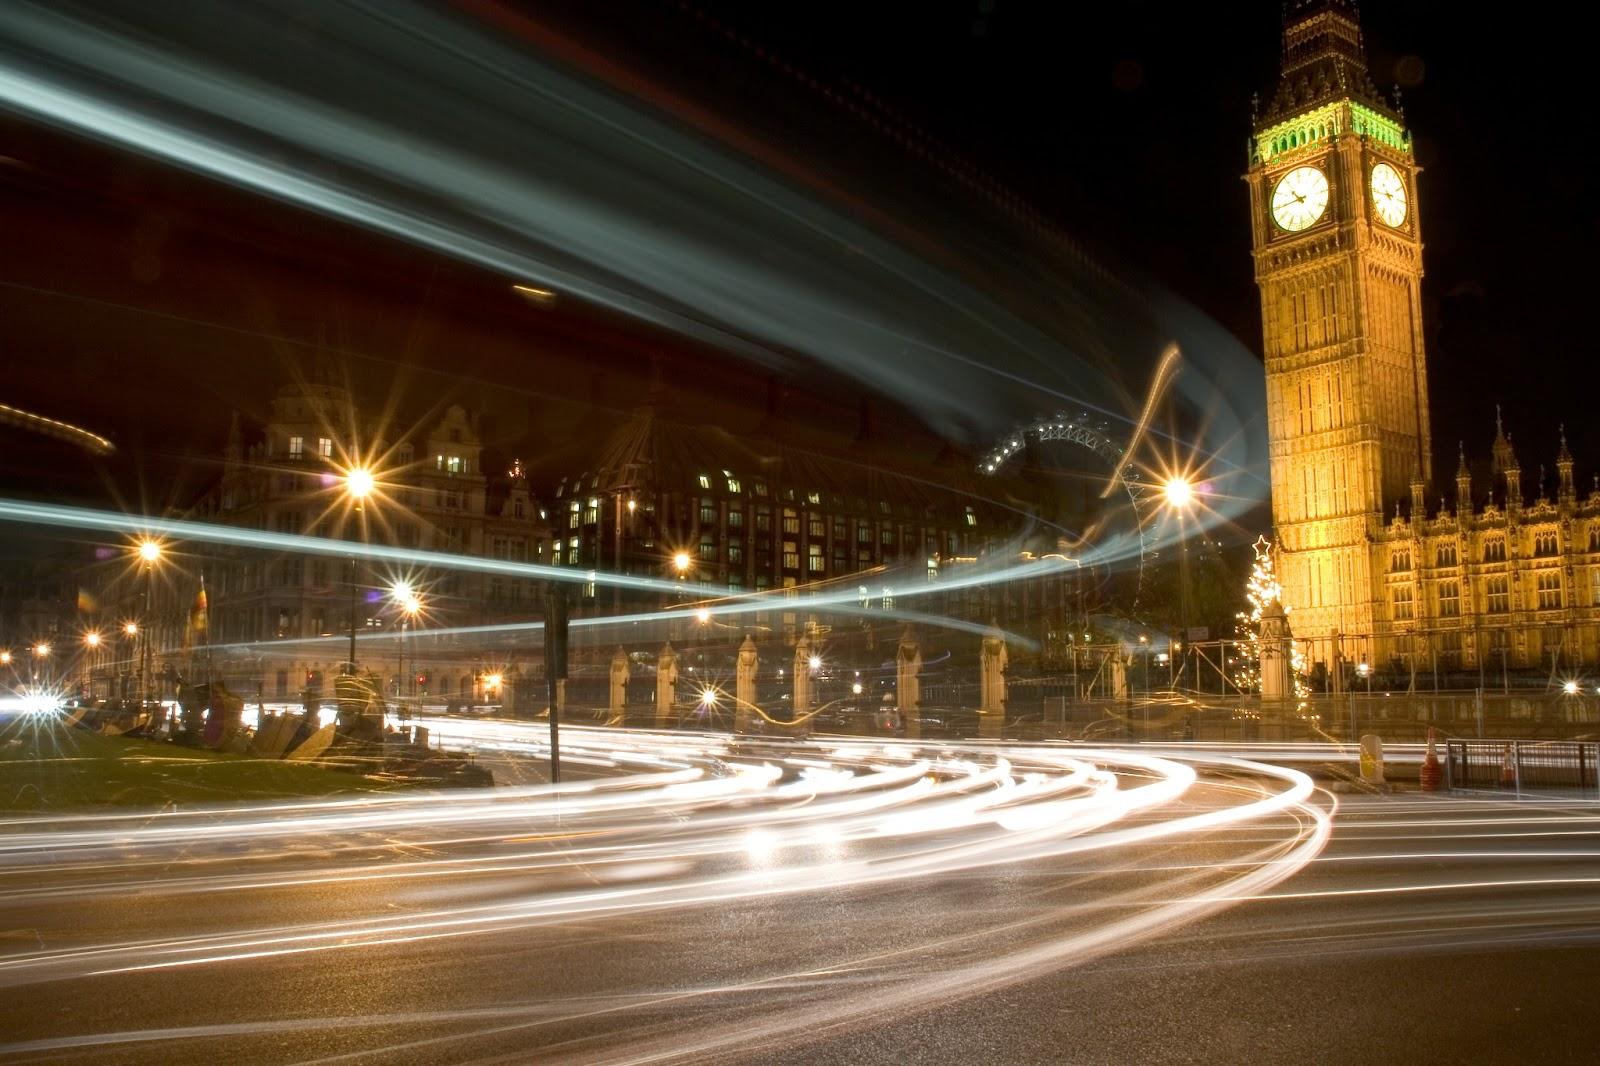 london high resolution - photo #11